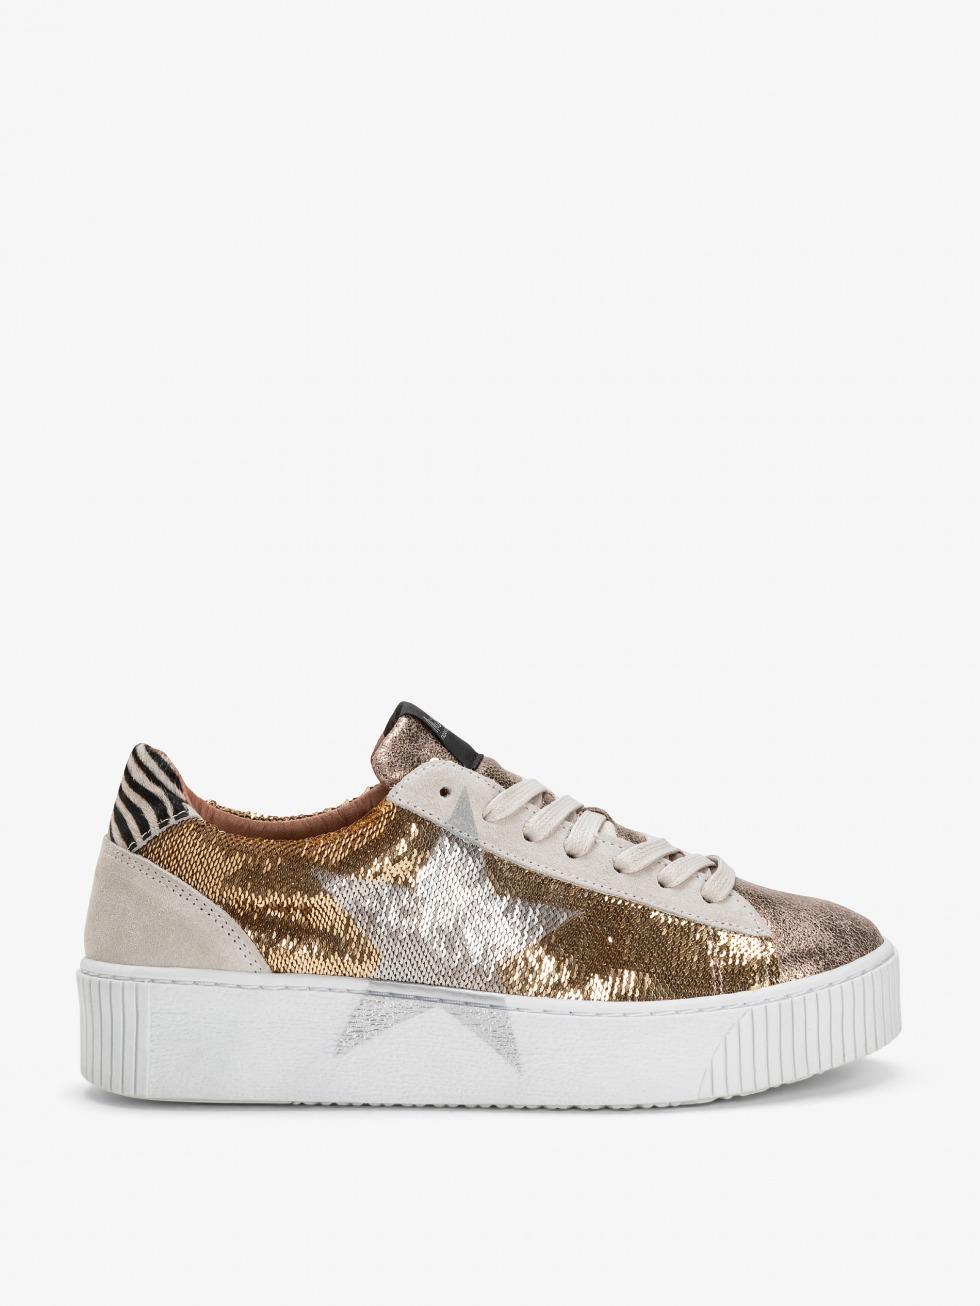 Cosmopolitan Sparkle Gold Sneakers - Star